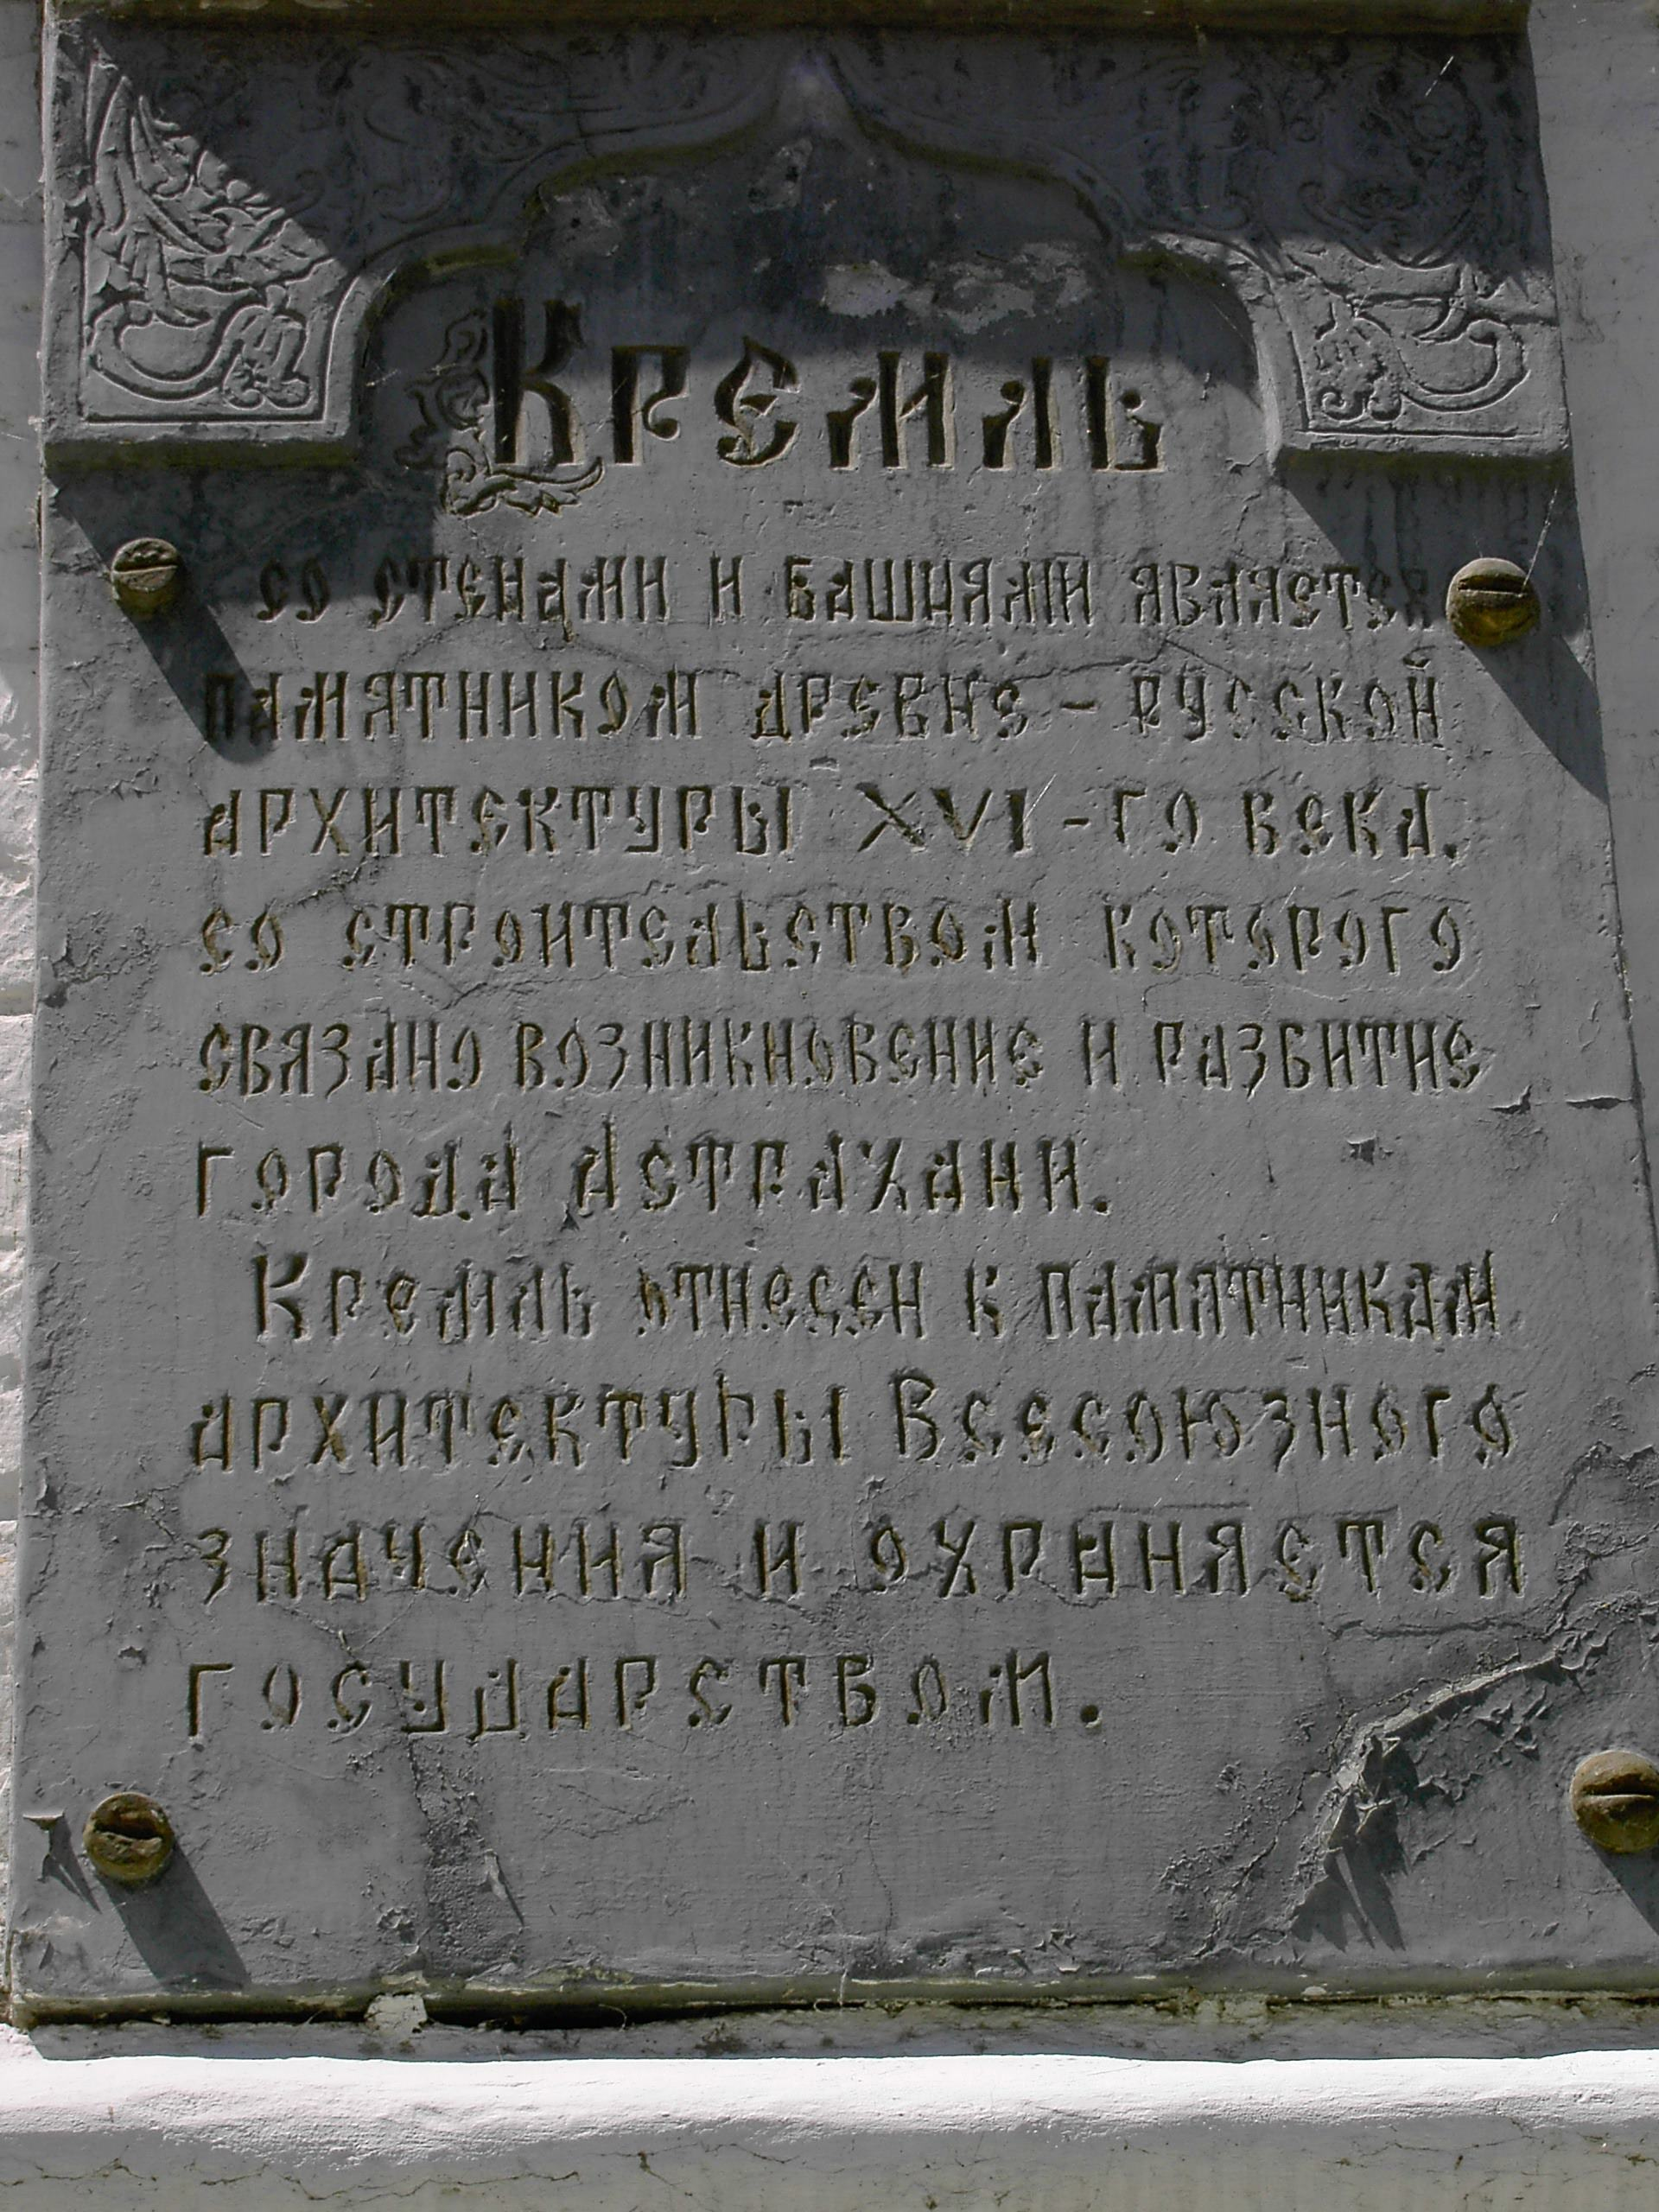 Табличка при входе 1 - г. Астрахань, Кремль